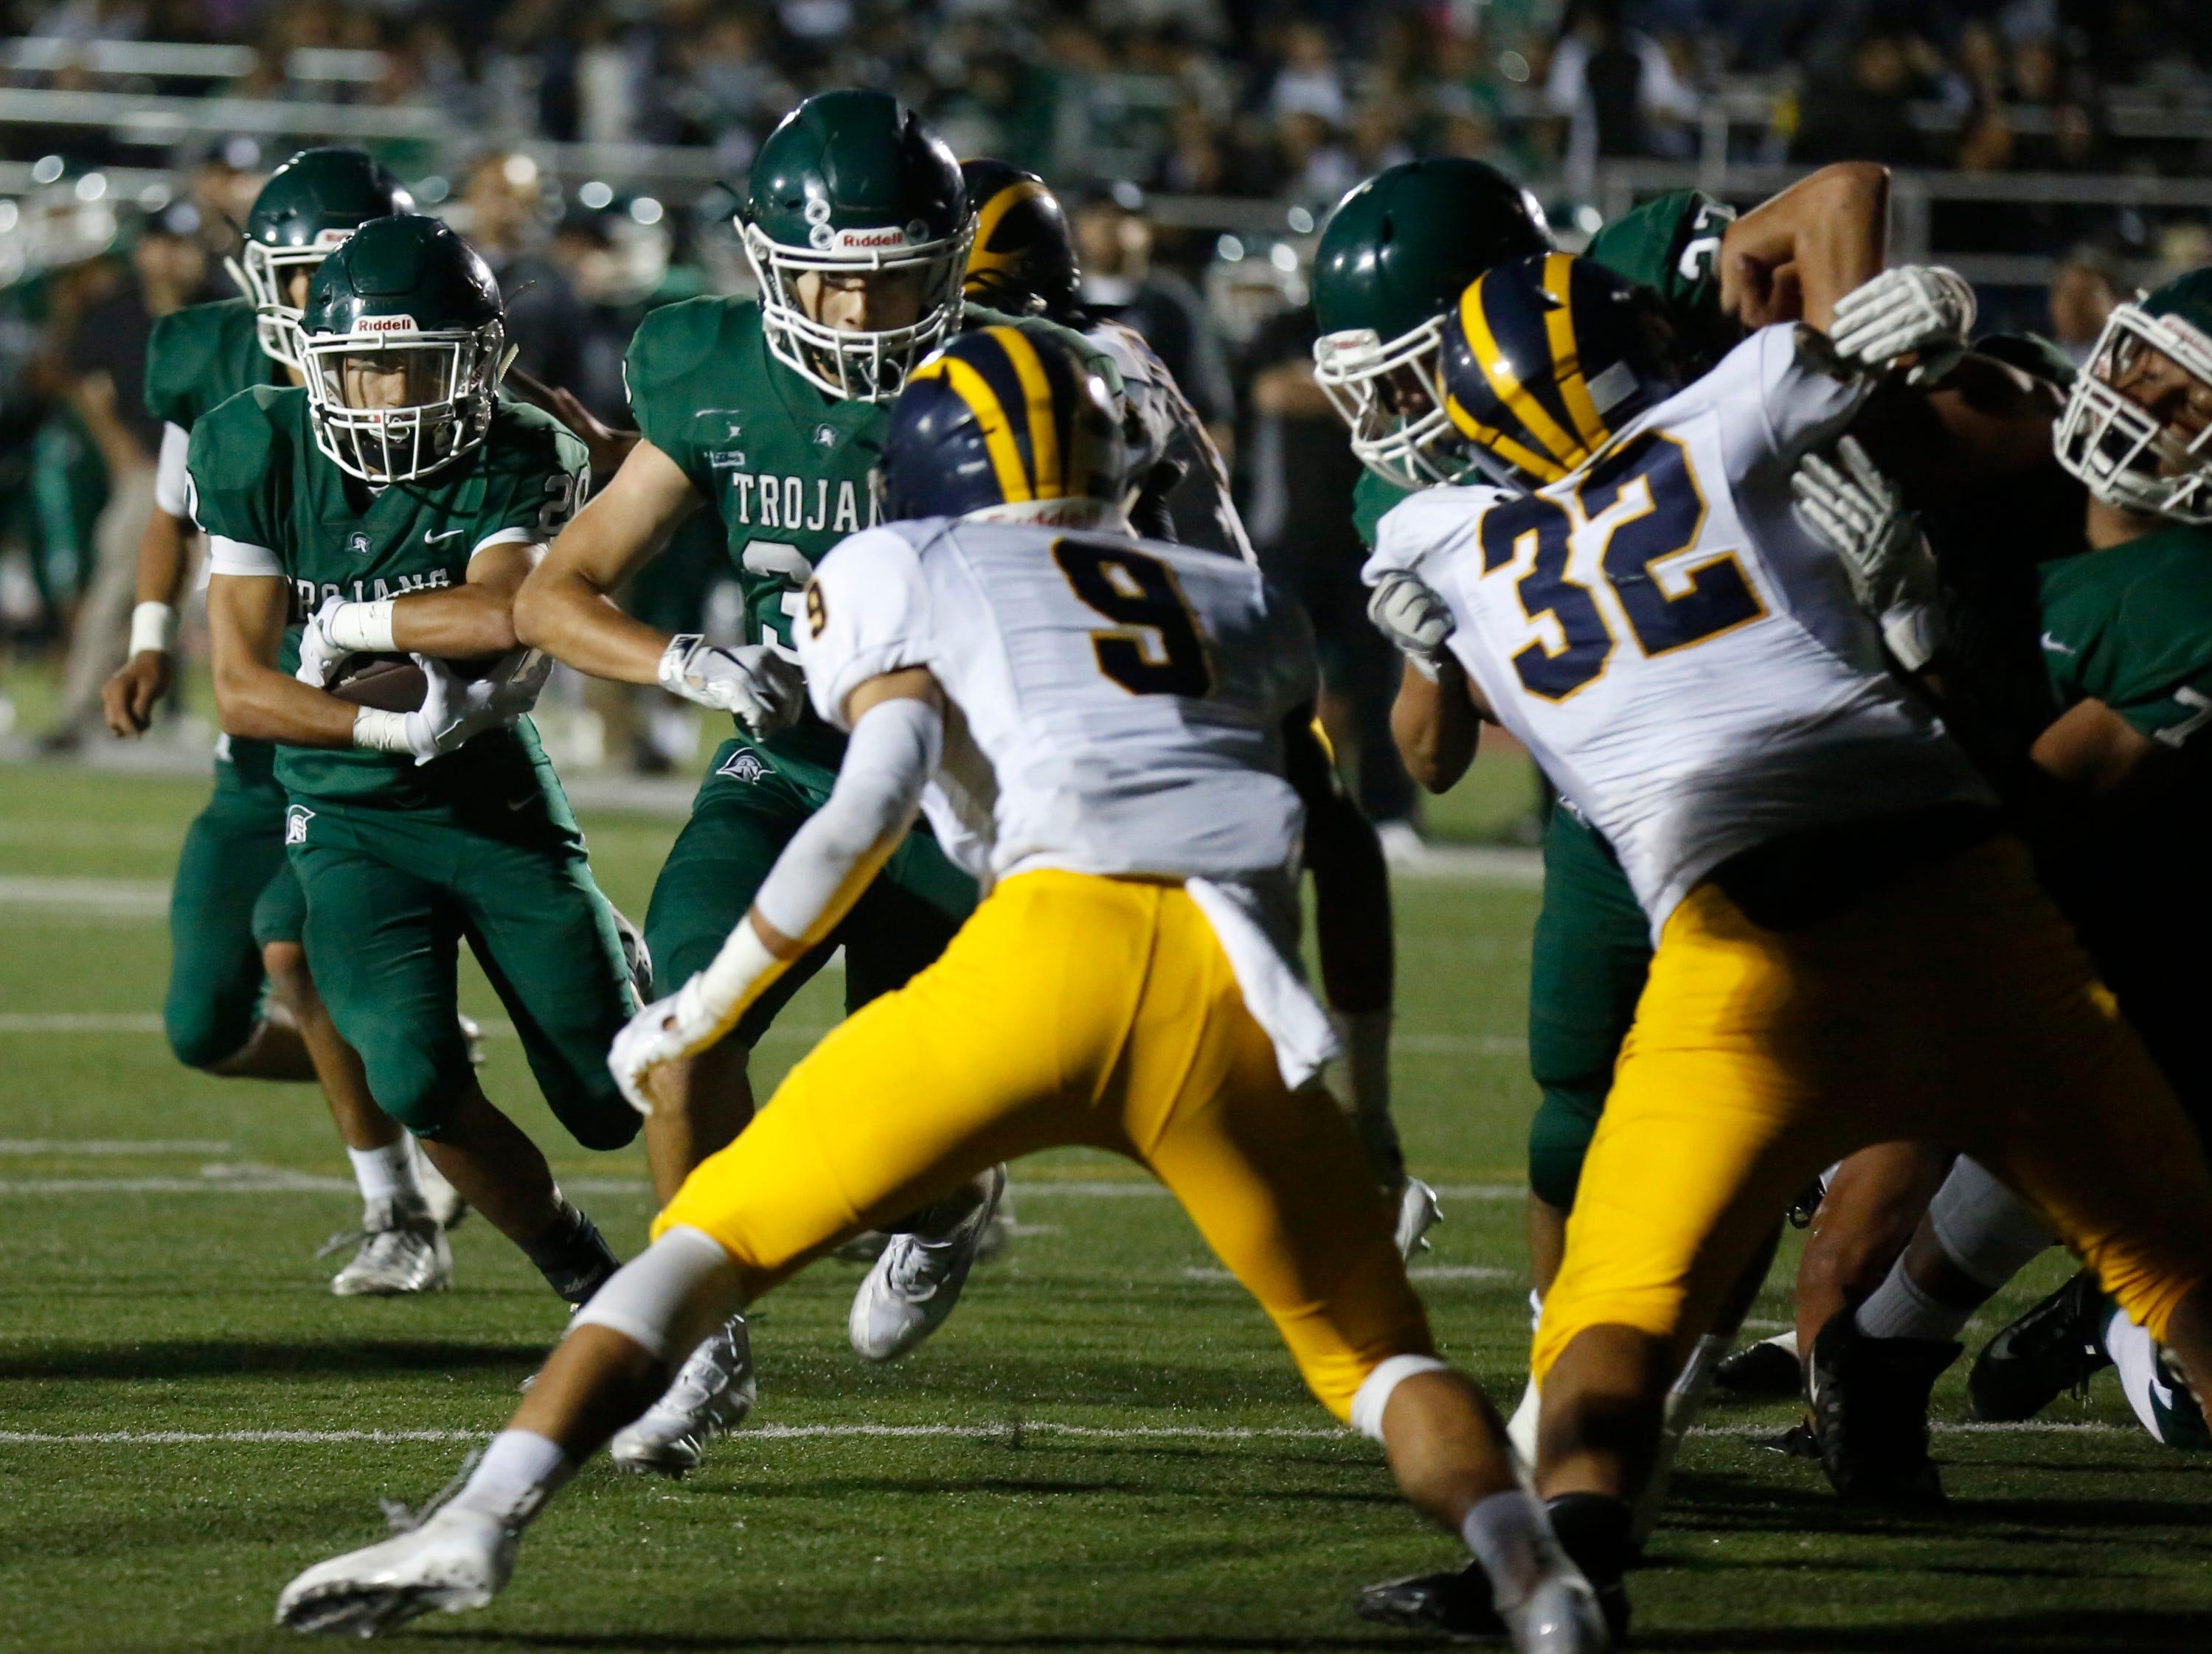 Alisal's Hernan Alvarez runs the ball against Everett Alvarez during football at Alisal High School in Salinas on Friday August 31, 2018. (Photo By David Royal)